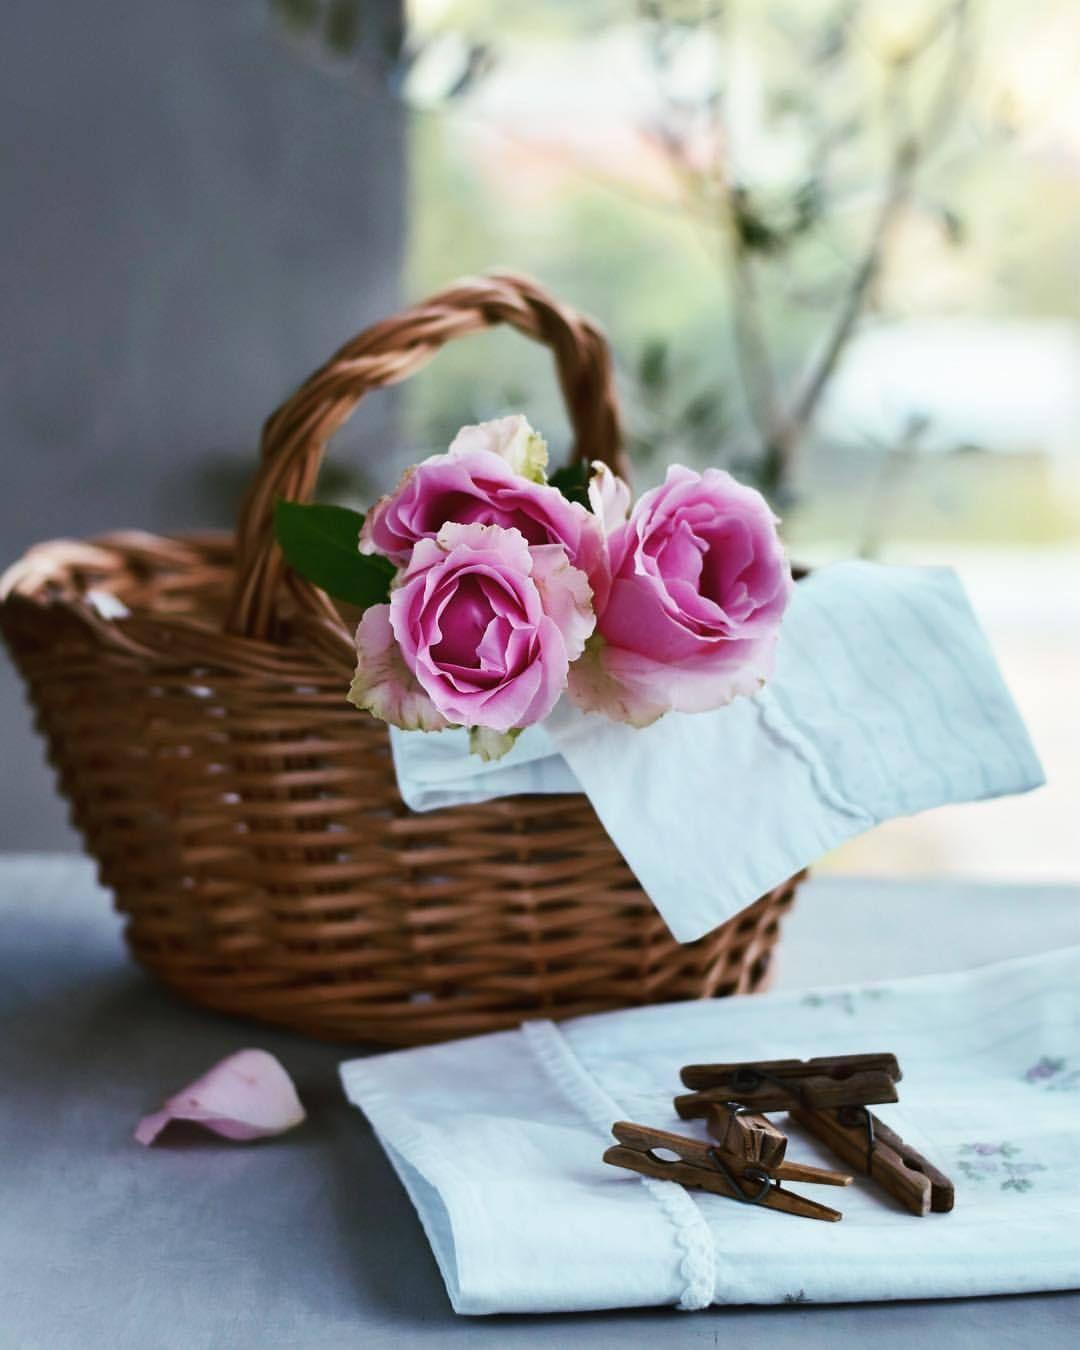 Soul Of An Angel Perfumes C Lardecoramado Raindrops And Roses Beautiful Flowers Perfume